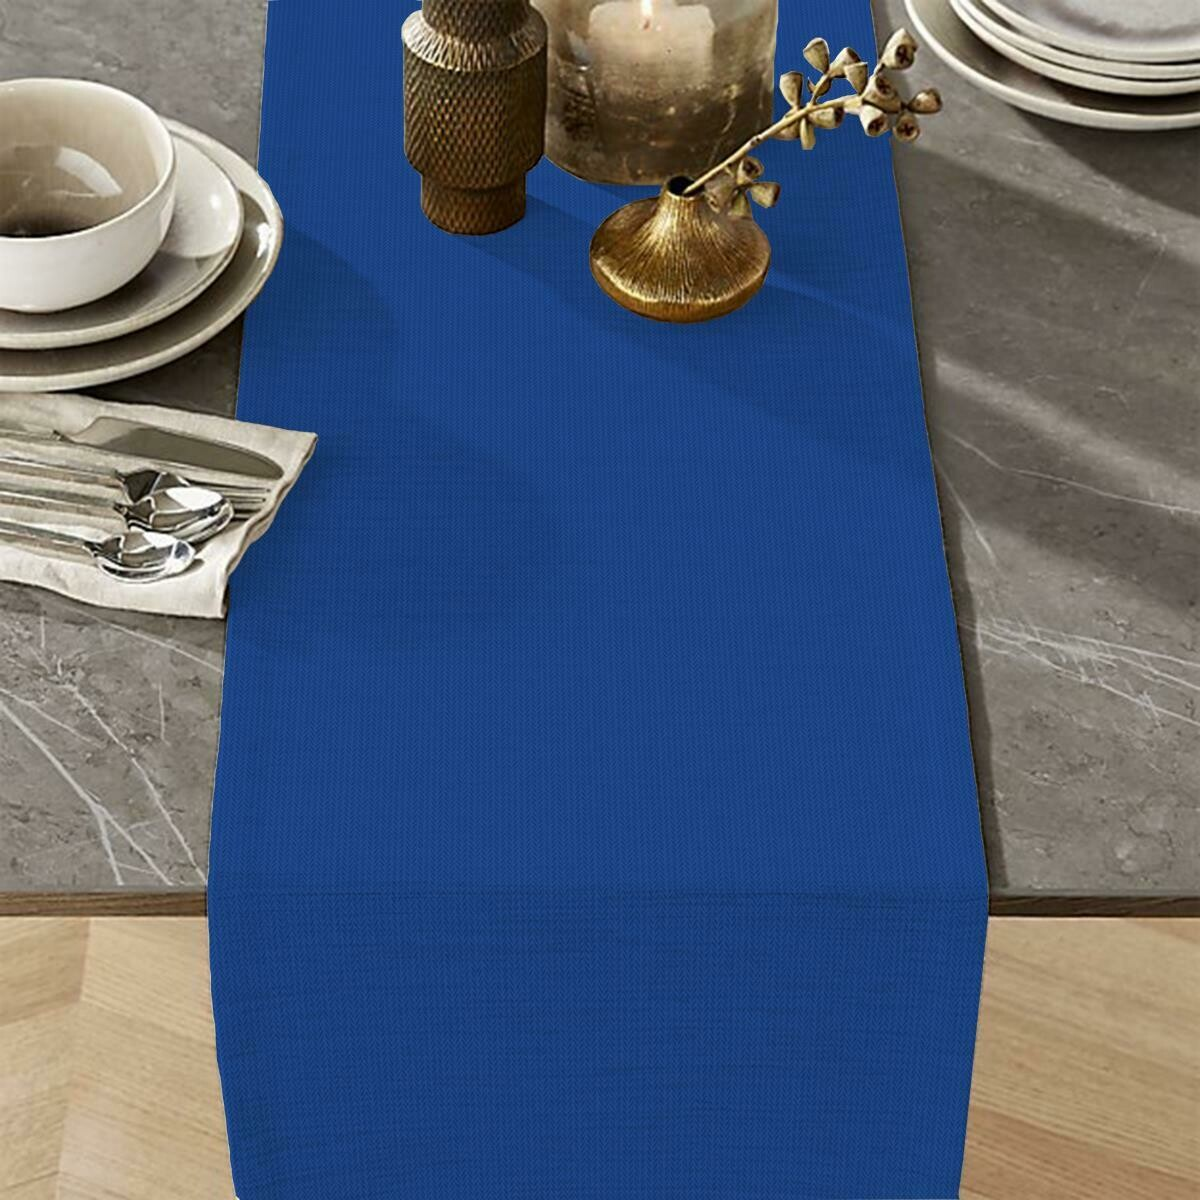 Дорожка 50 см 35029-3 Синий